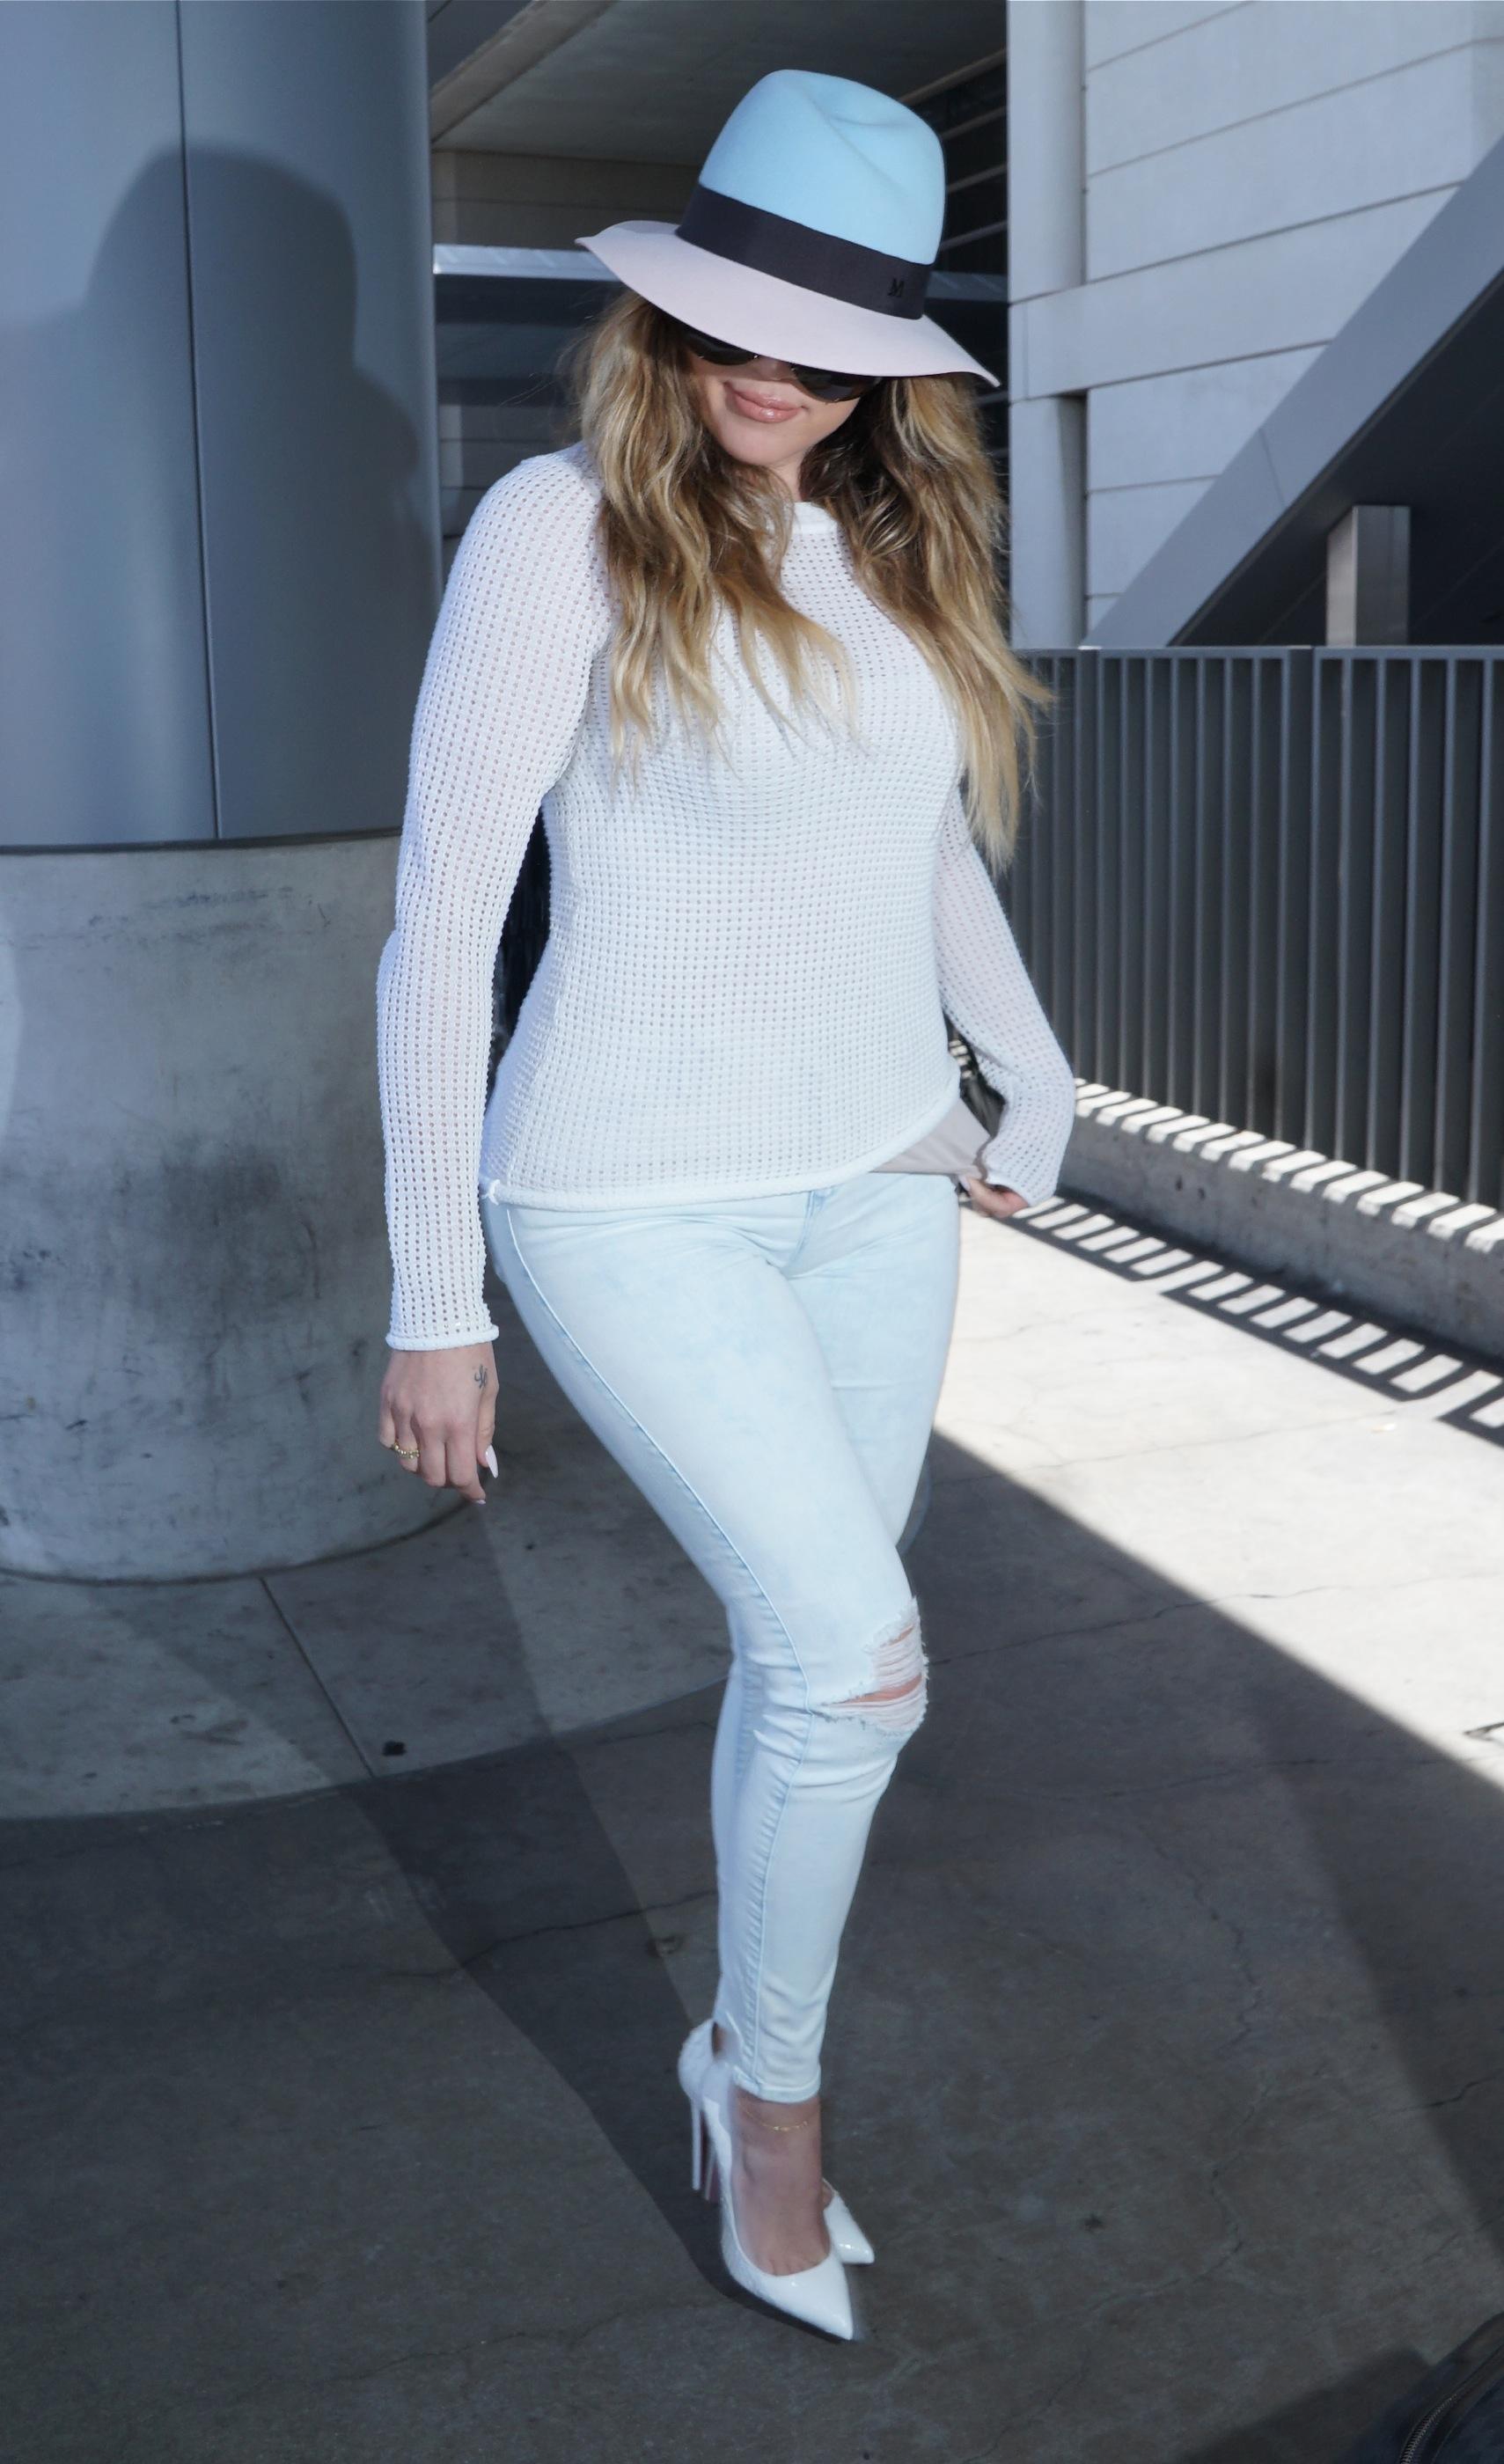 Khole Kardashian arriving at LAX